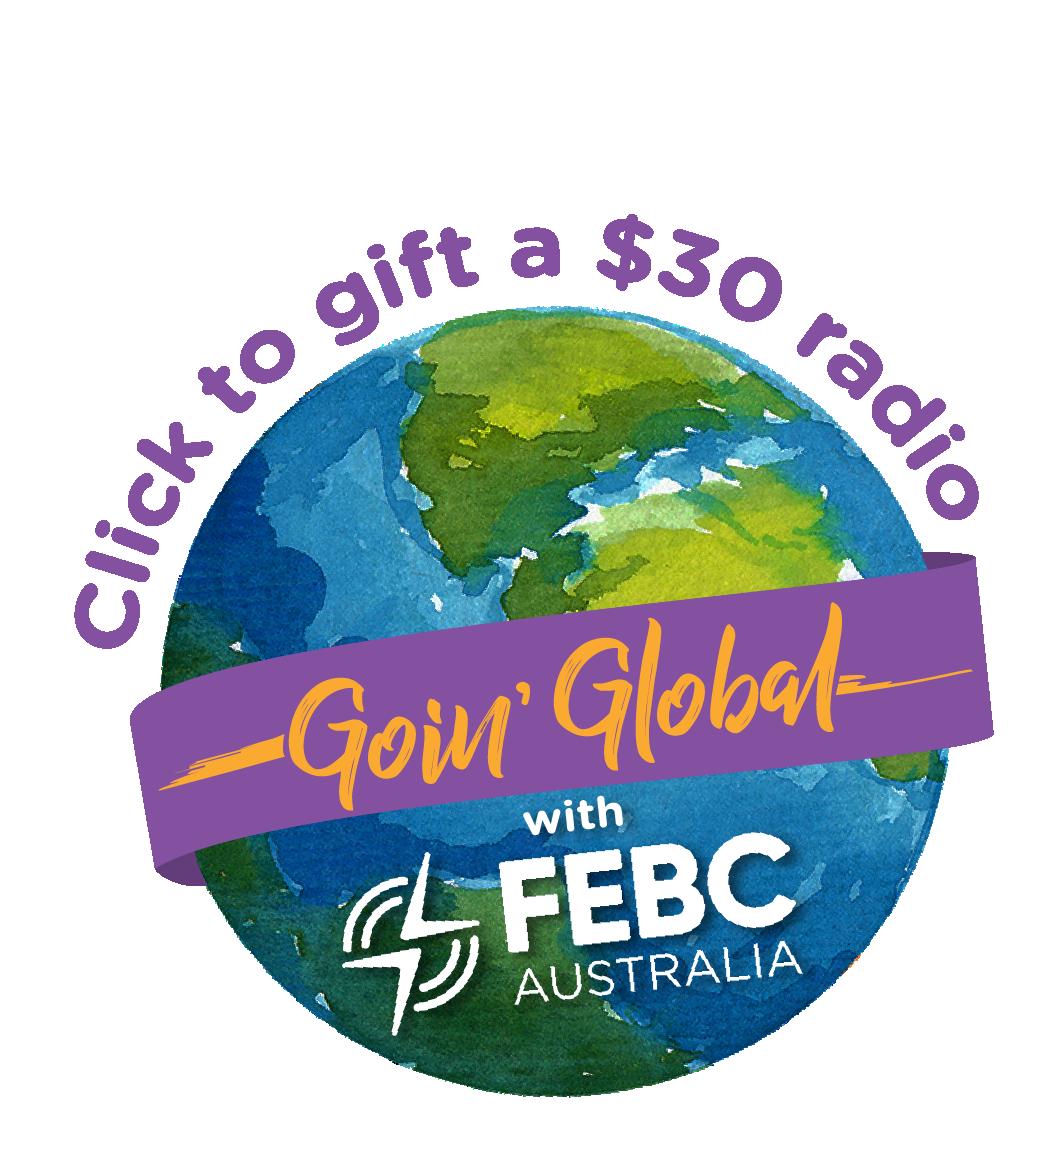 https://febc.org.au/goinglobal/